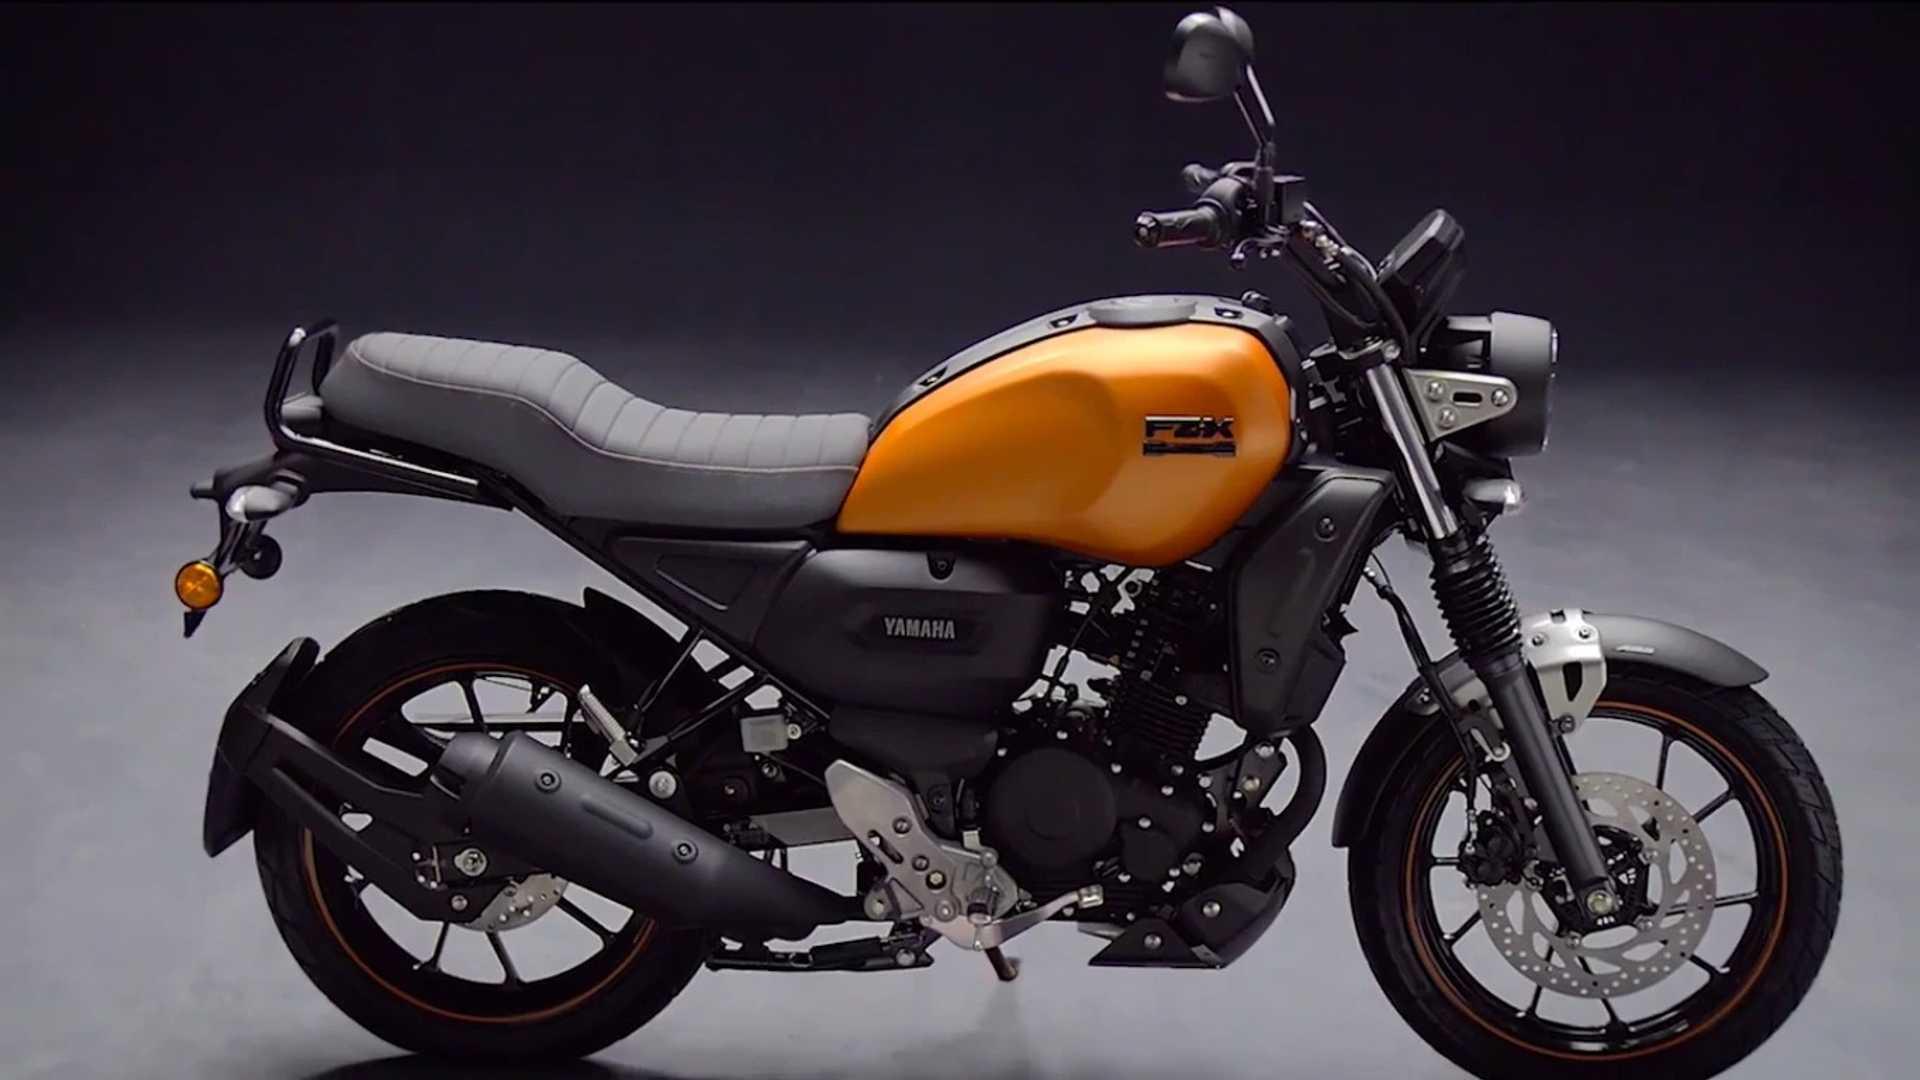 Yamaha FZ-X Retro ,2021 Yamaha FZ-X Retro,yamaha fz-x bike,yamaha fz-x 150cc,yamaha fz-x 150 mileage,yamaha fz-x 250,yamaha fz-x 150 price,yamaha fz-x bike price,yamaha fz-x 150 launch date in india,yamaha fz-x price,yamaha fz-x adventure